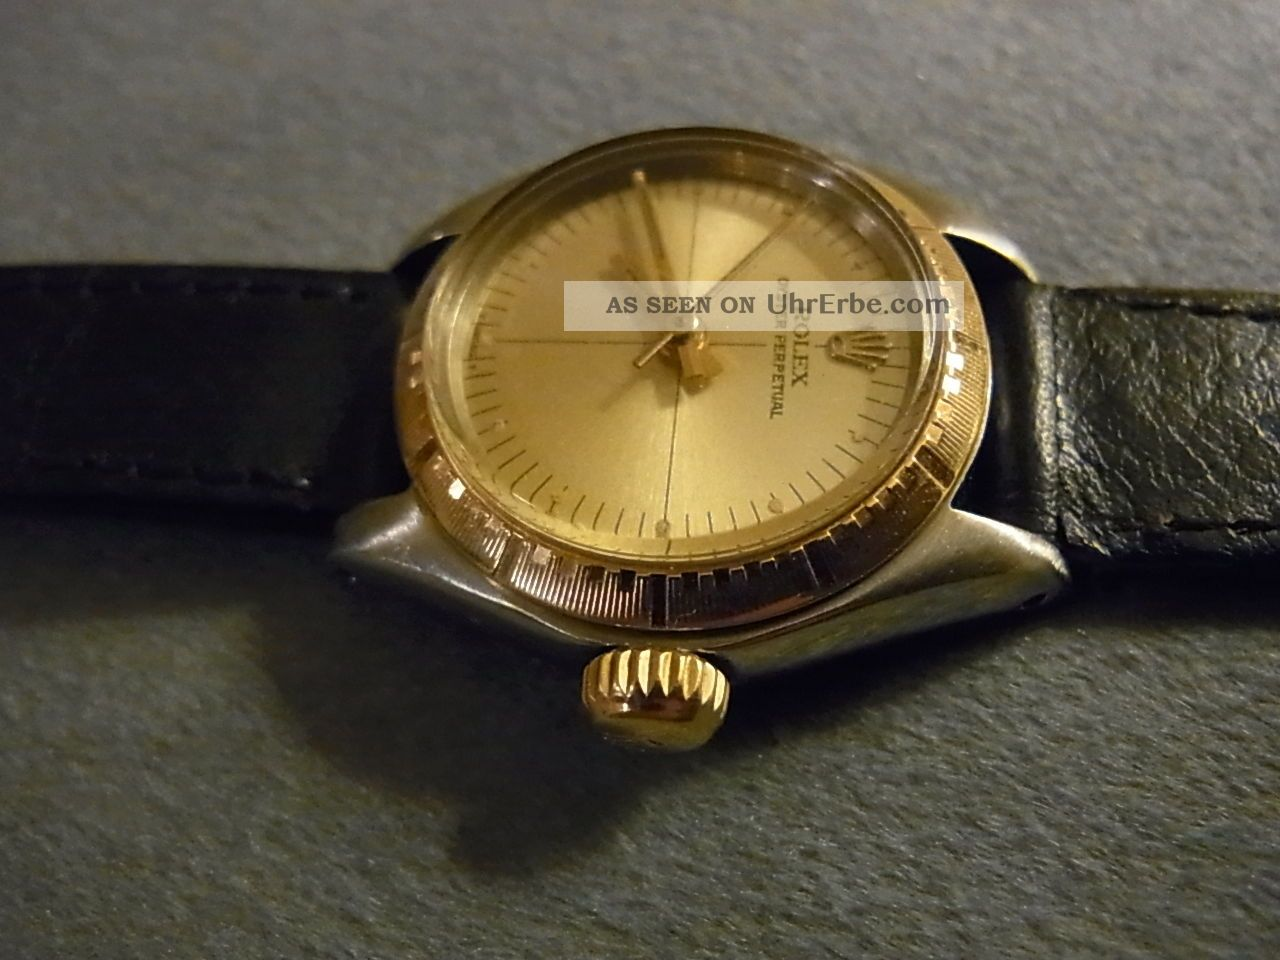 Damenluxusuhr Rolex Modell Oyster Perpetual No Date Stahl/gold, Armbanduhren Bild